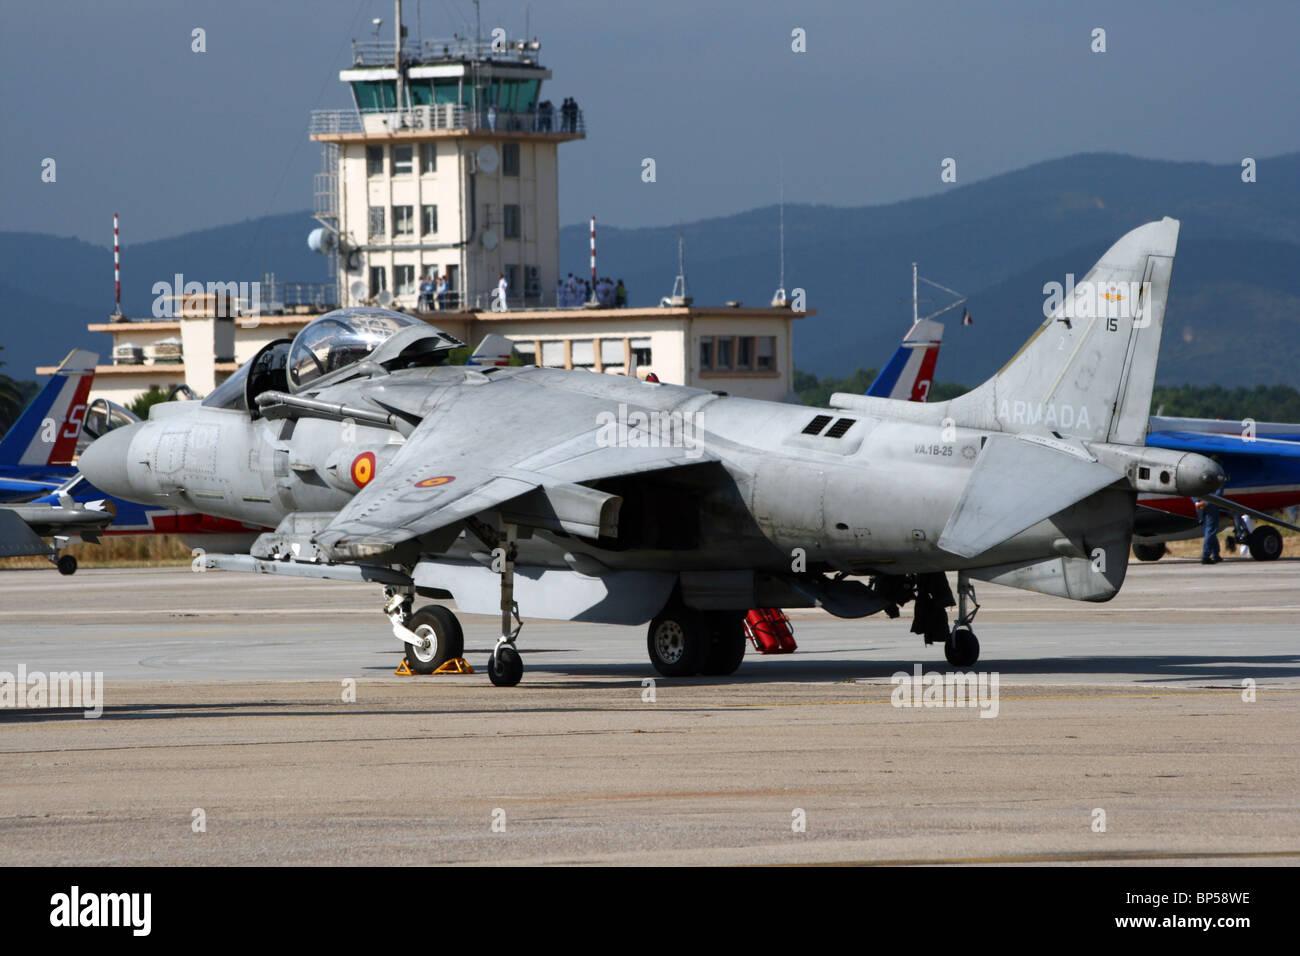 Spanish Navy AV-8B Harrier fighter jet at the French Navy base Hyeres. Stock Photo